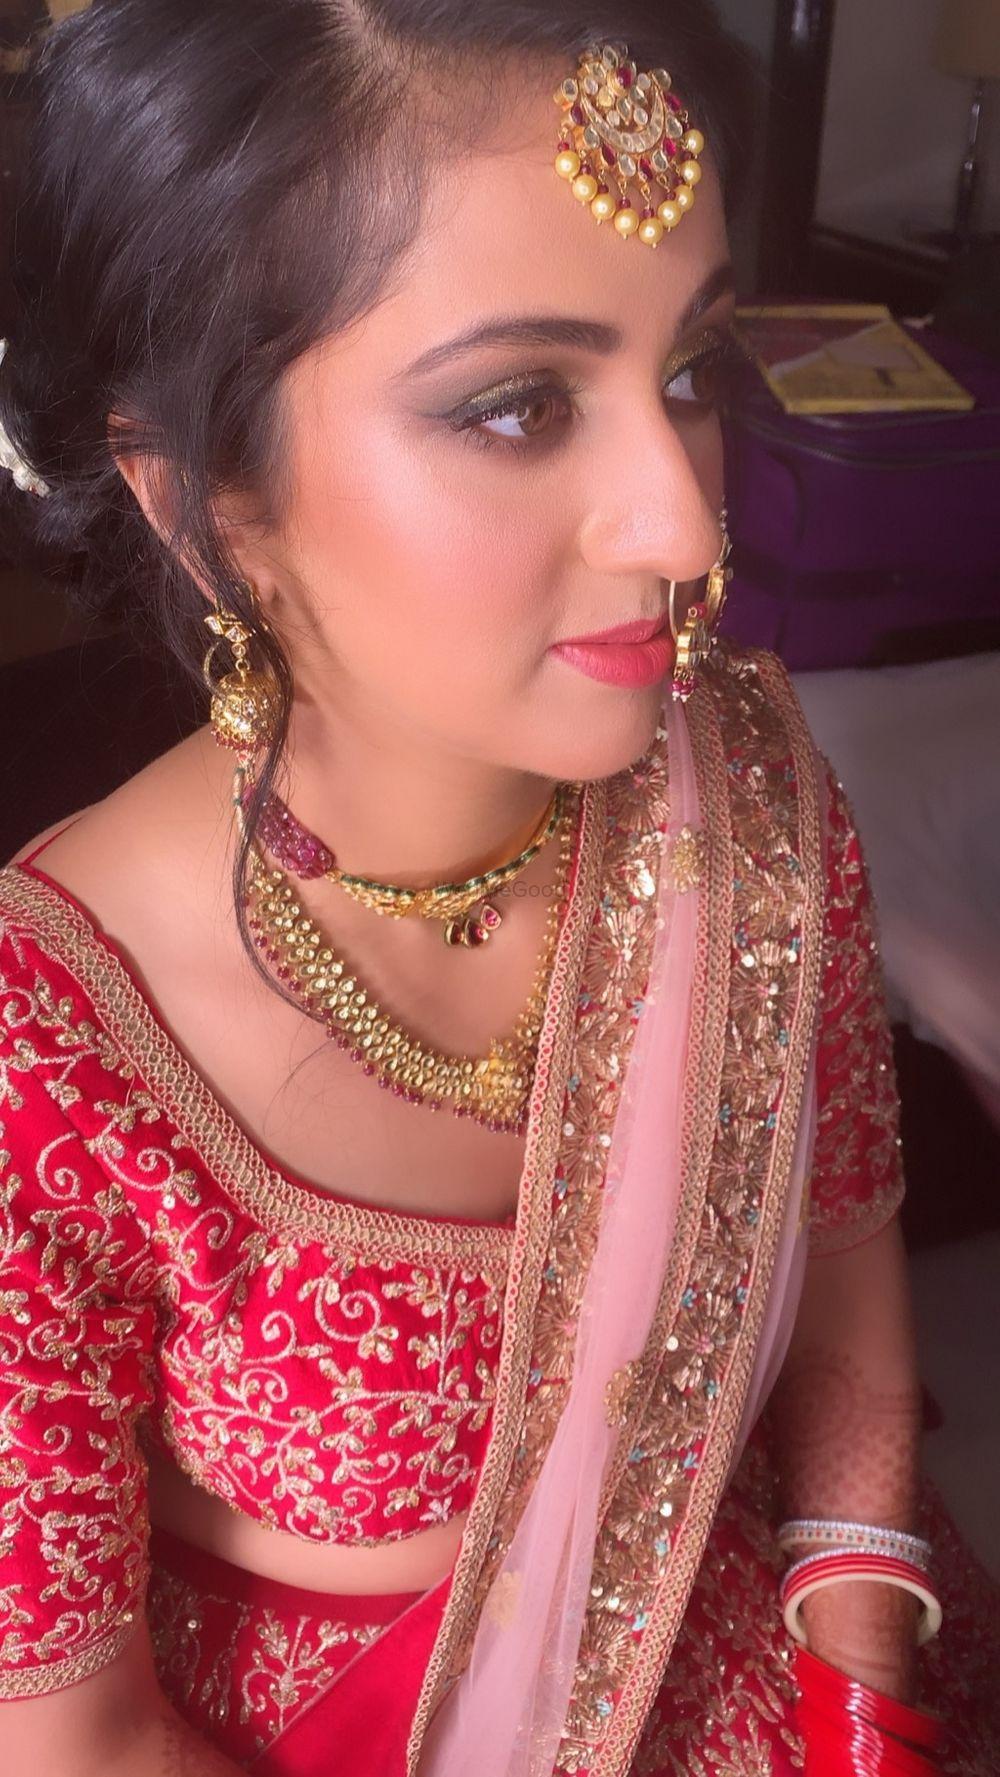 Photo From Shagun_ phone clicks  - By Nivritti Chandra